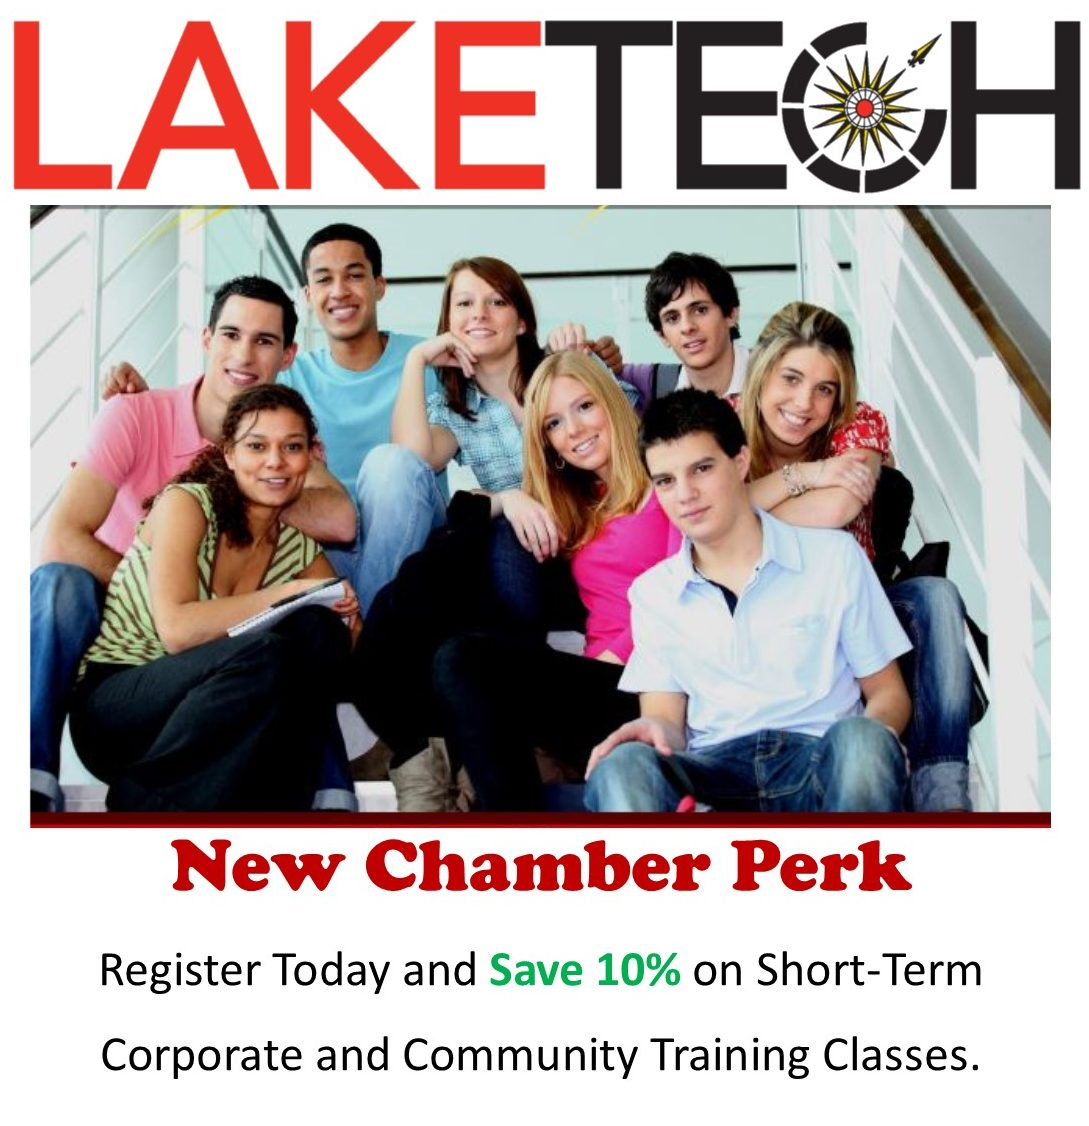 lake-tech-chamber-perk